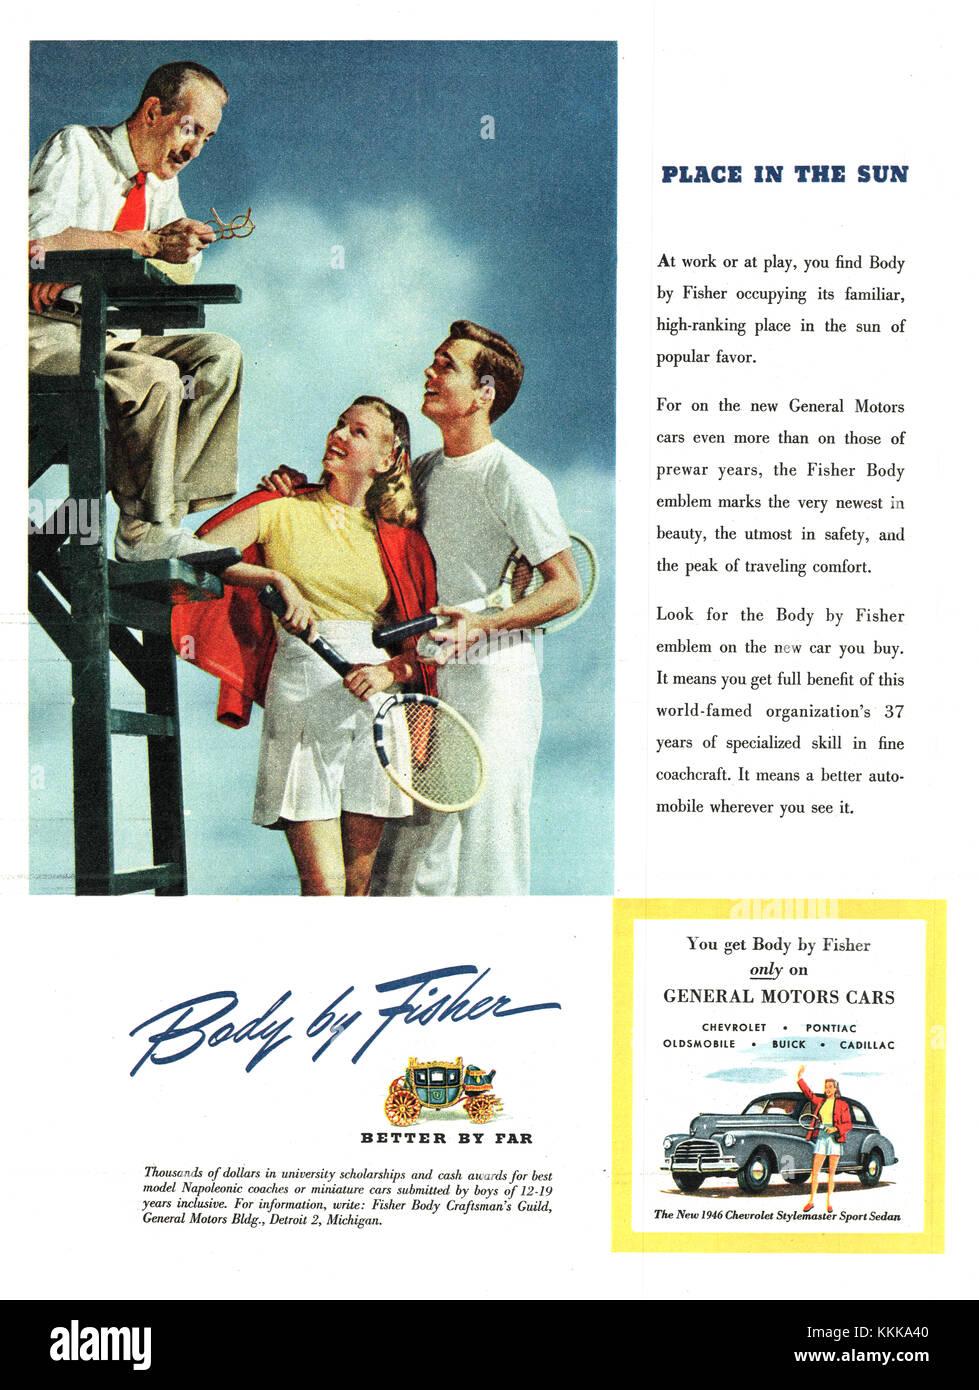 1946 U.S. Magazine Fisher Car Body Advert - Stock Image